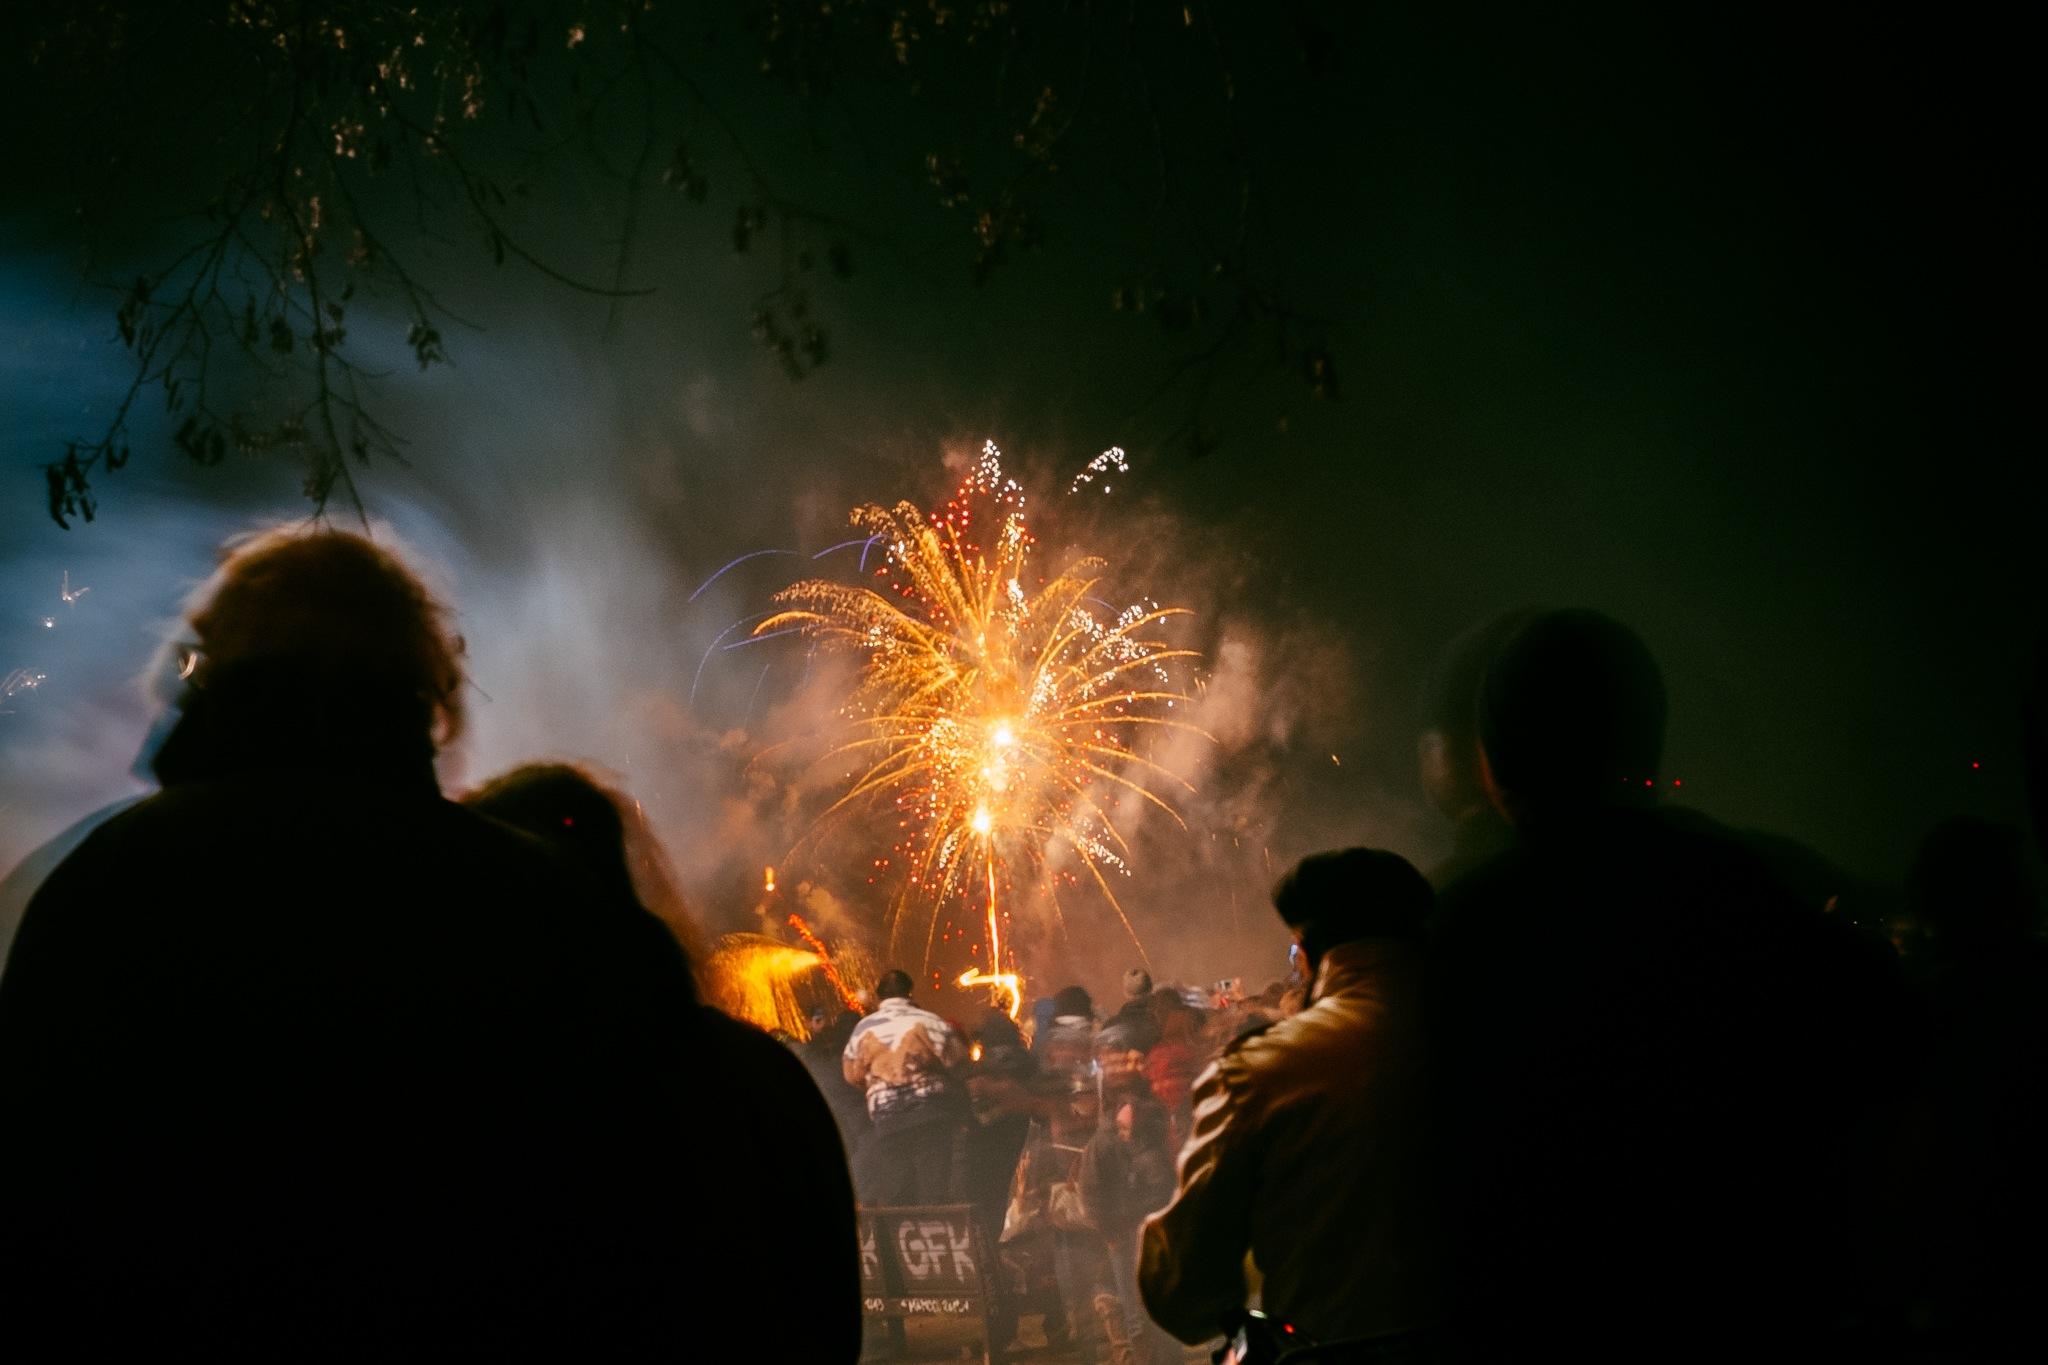 Fireworks exploding against a dark night sky.